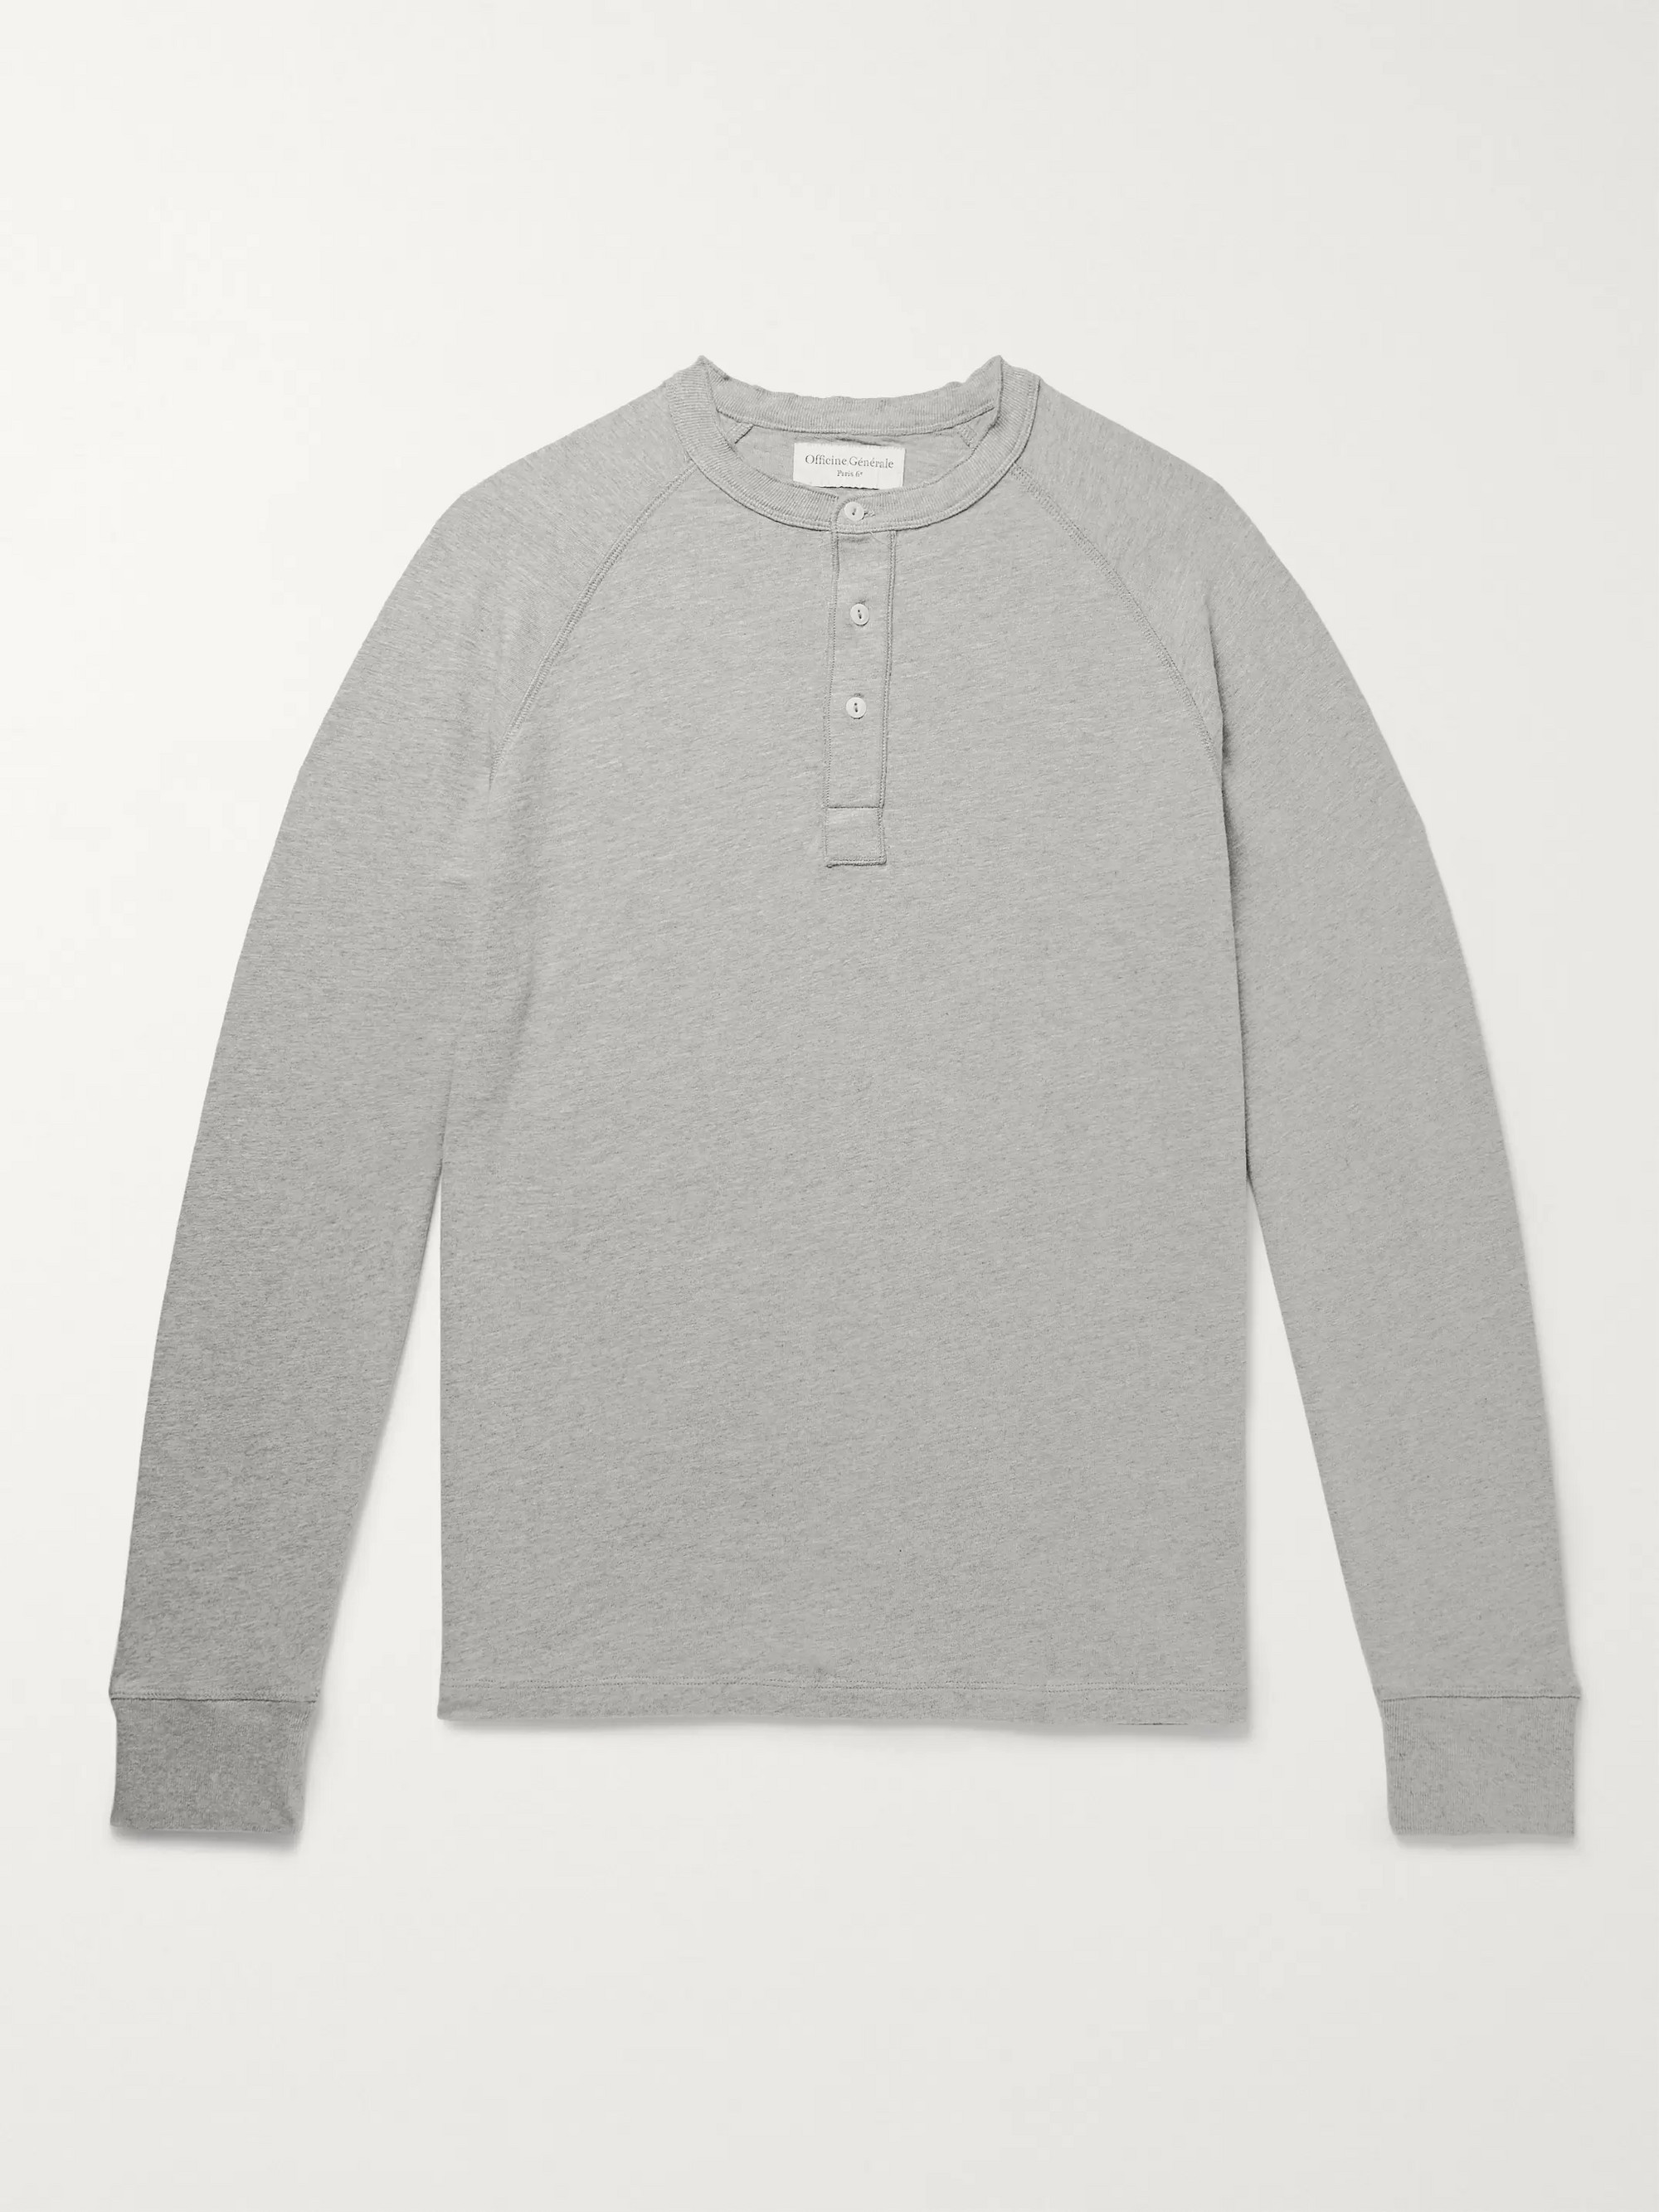 4bcb26e458e5 Gray Mélange Loopback Cotton-Jersey Henley T-Shirt | Officine ...